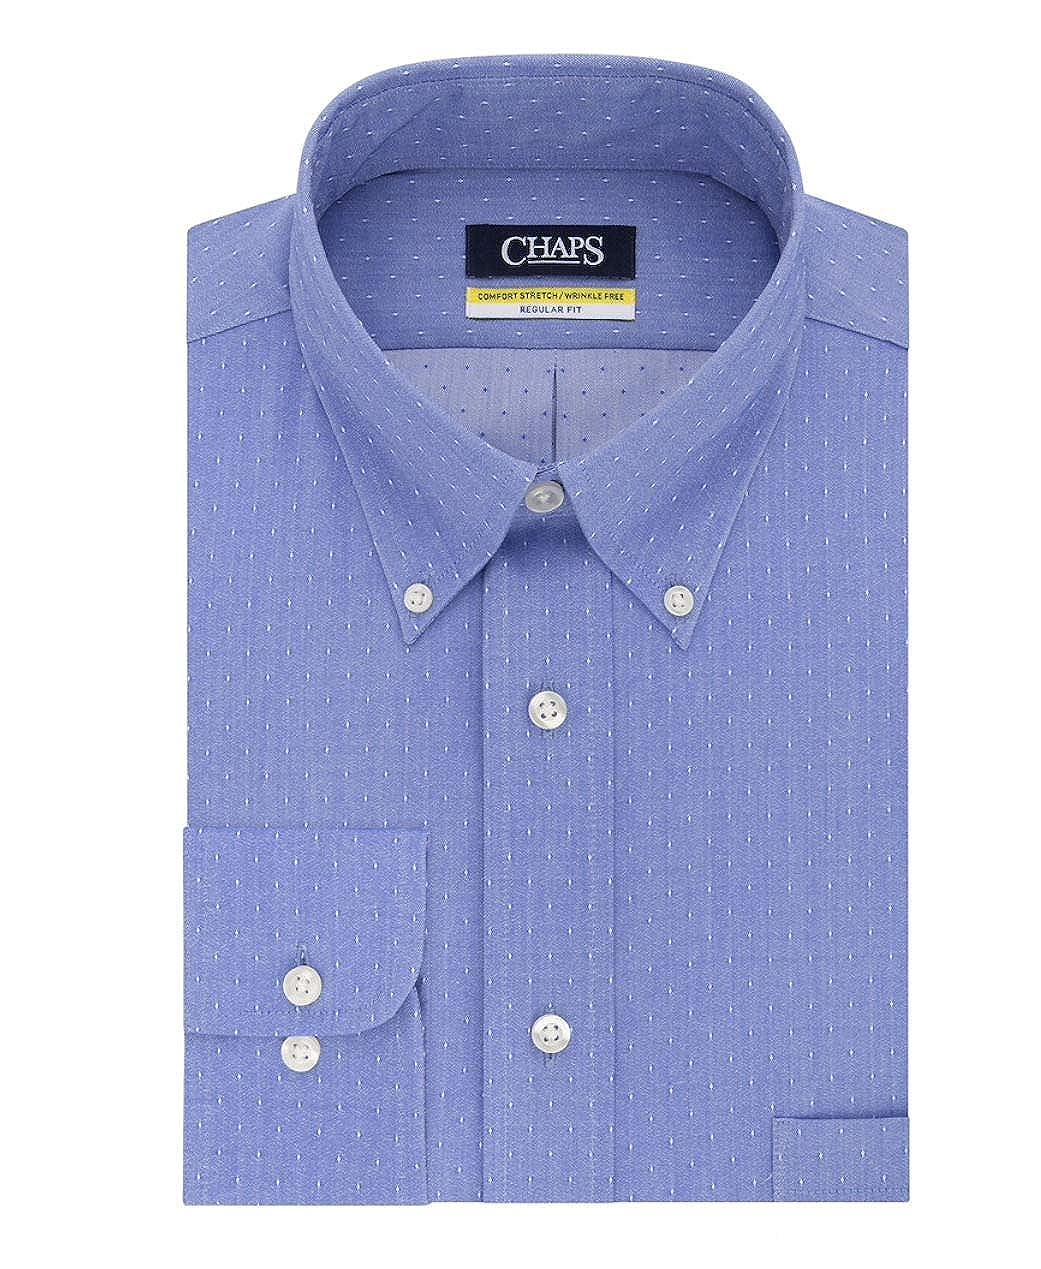 Cobalt, Neck 15.5 Sleeve 32-33 Chaps Mens Elite Performance Regular Fit Comfort Stretch Spread Collar Dress Shirt